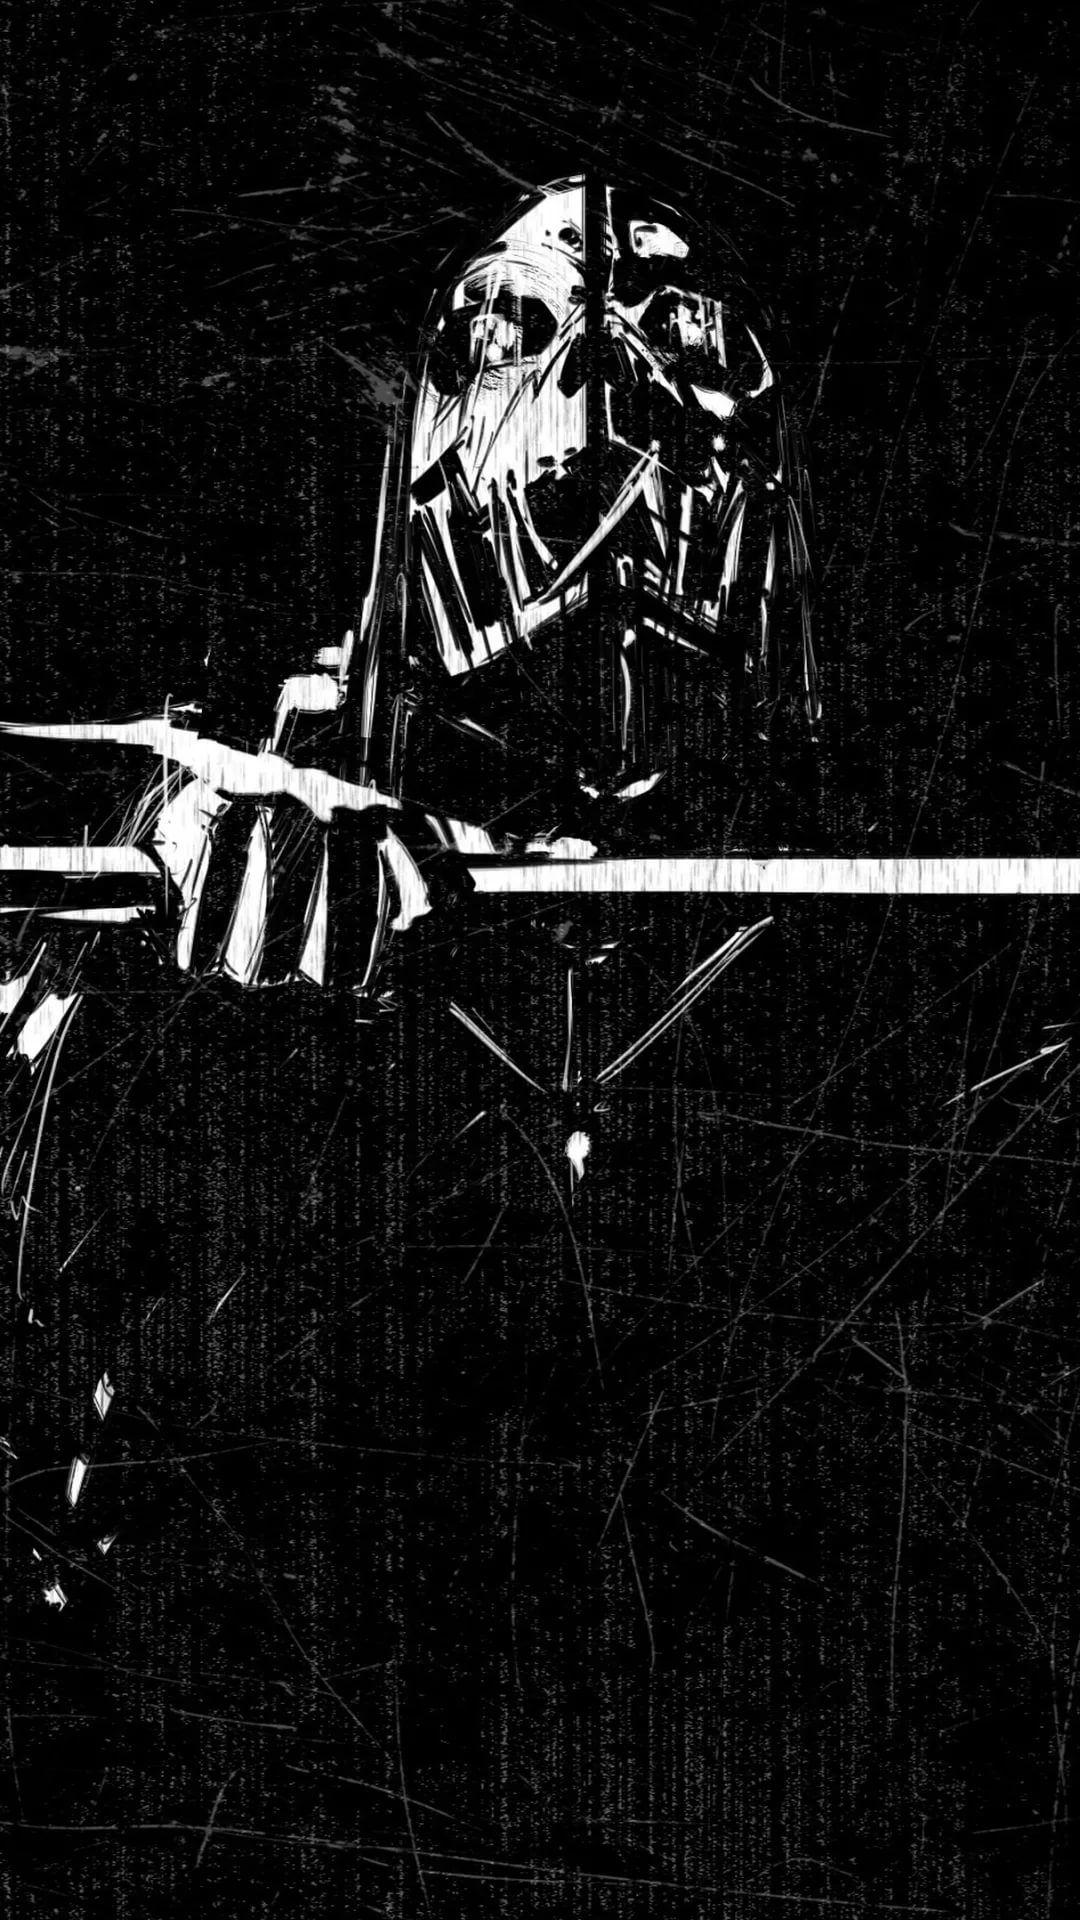 Punisher iPhone wallpaper